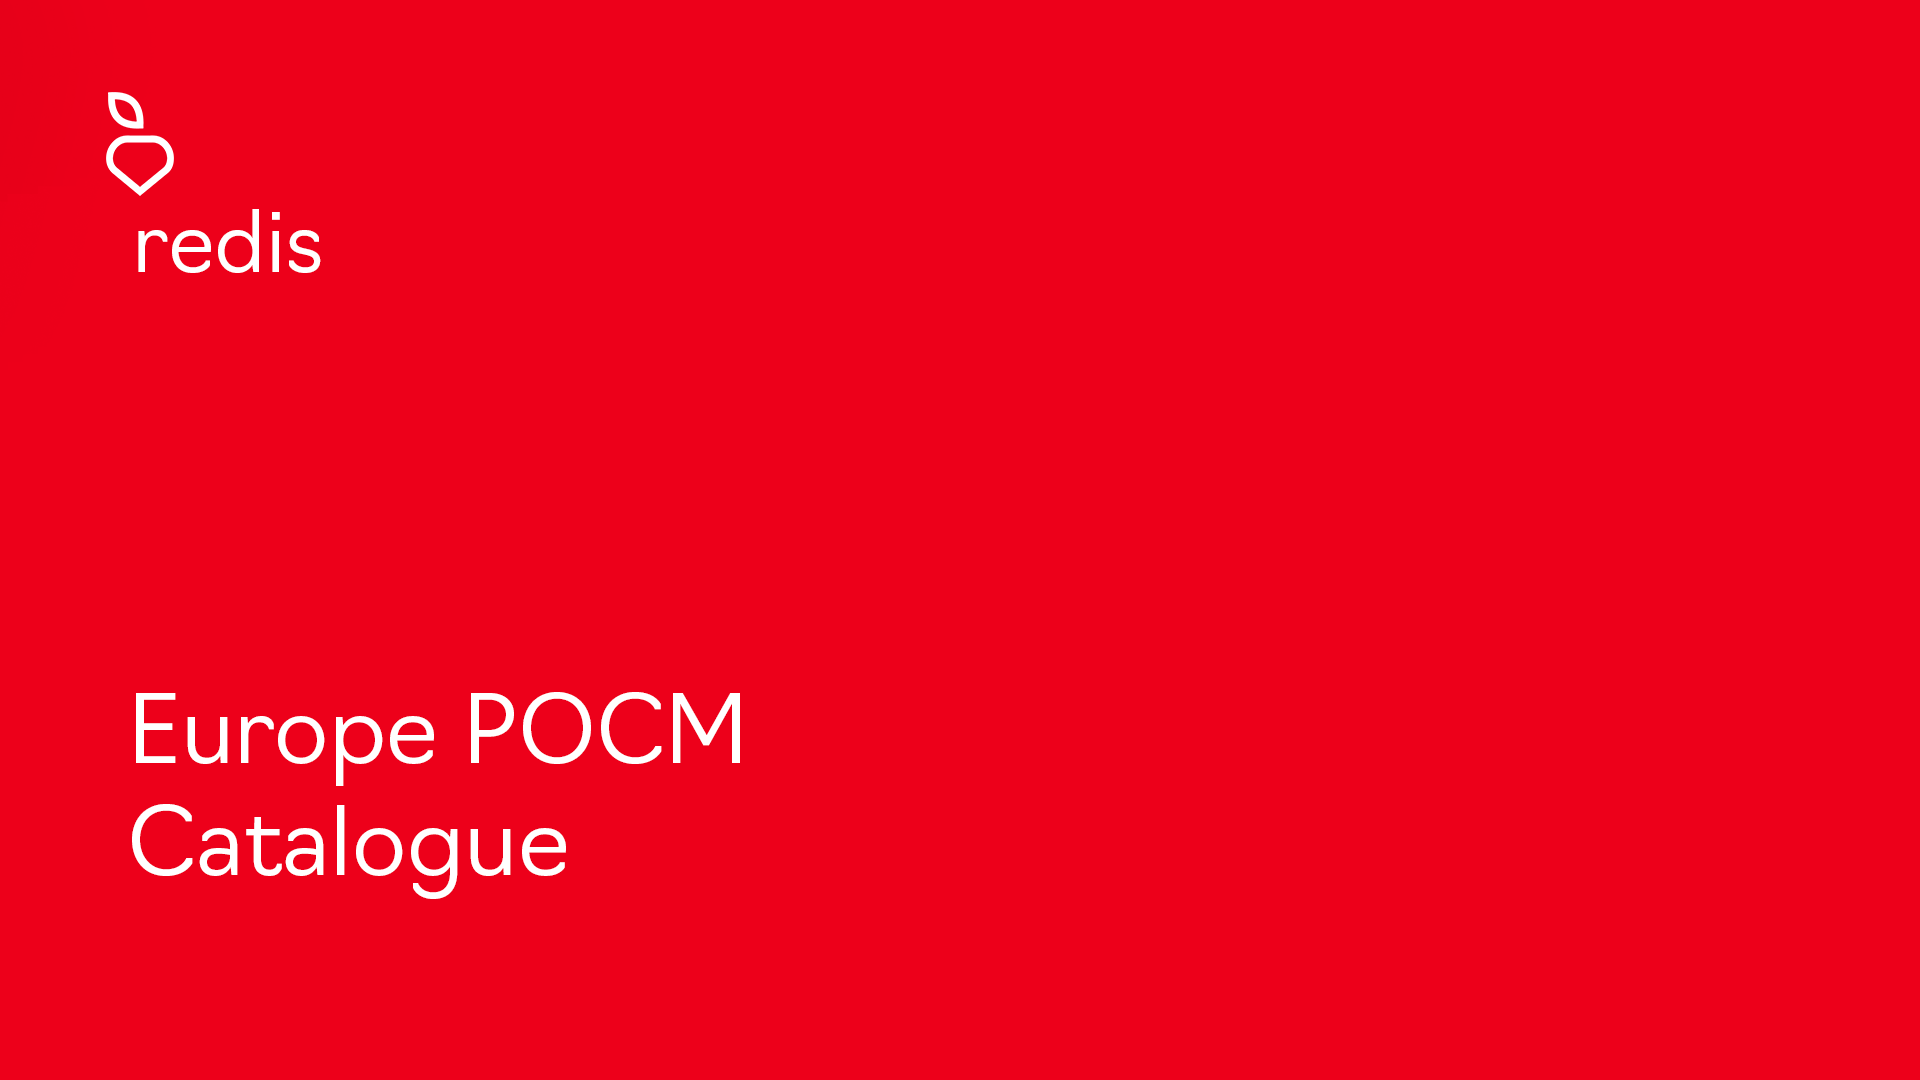 POCM Catalogue